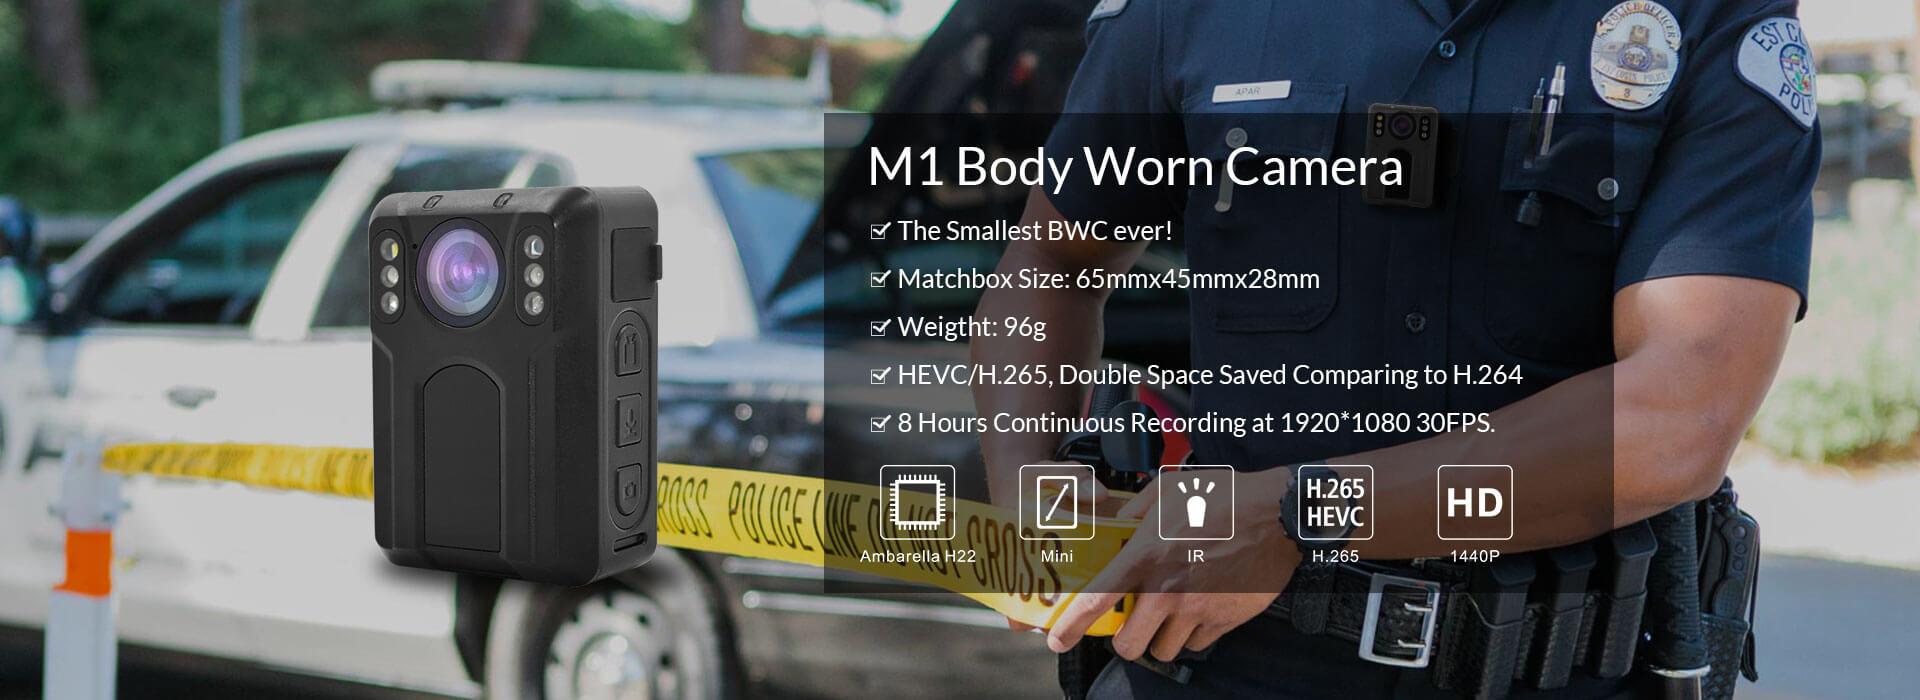 M1 Body Worn Camera